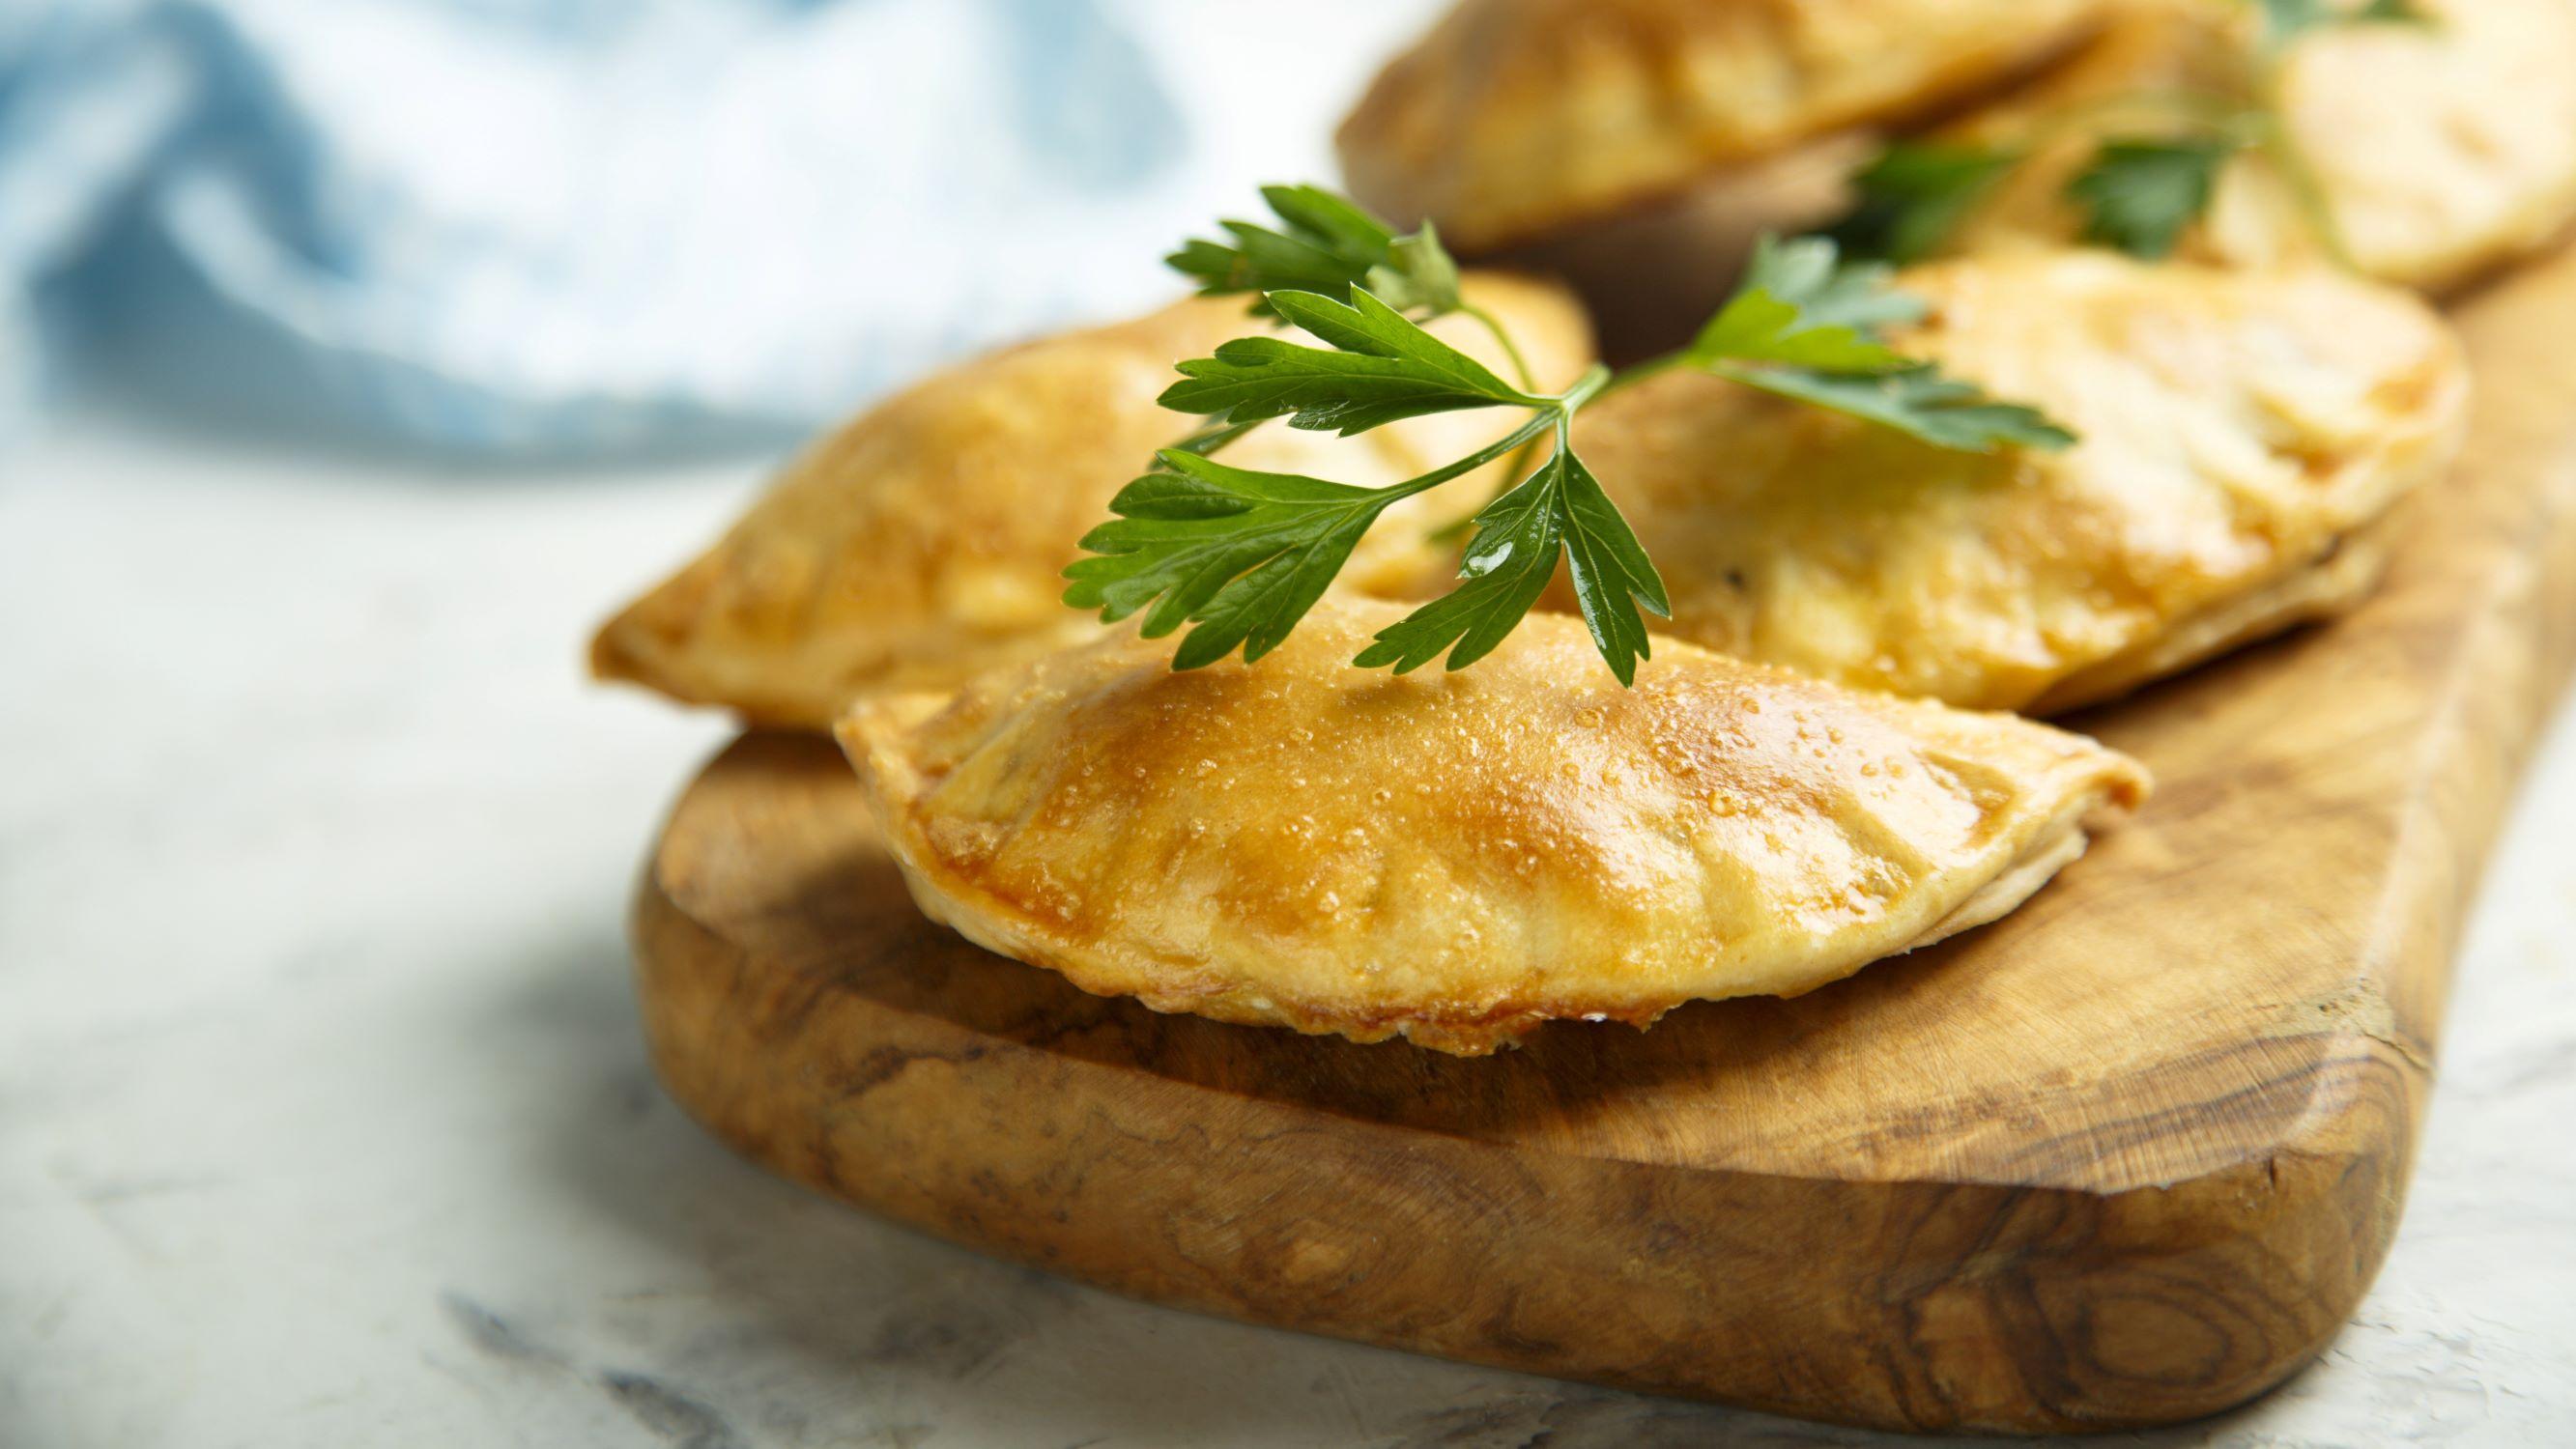 Image for Make your own Empanadas